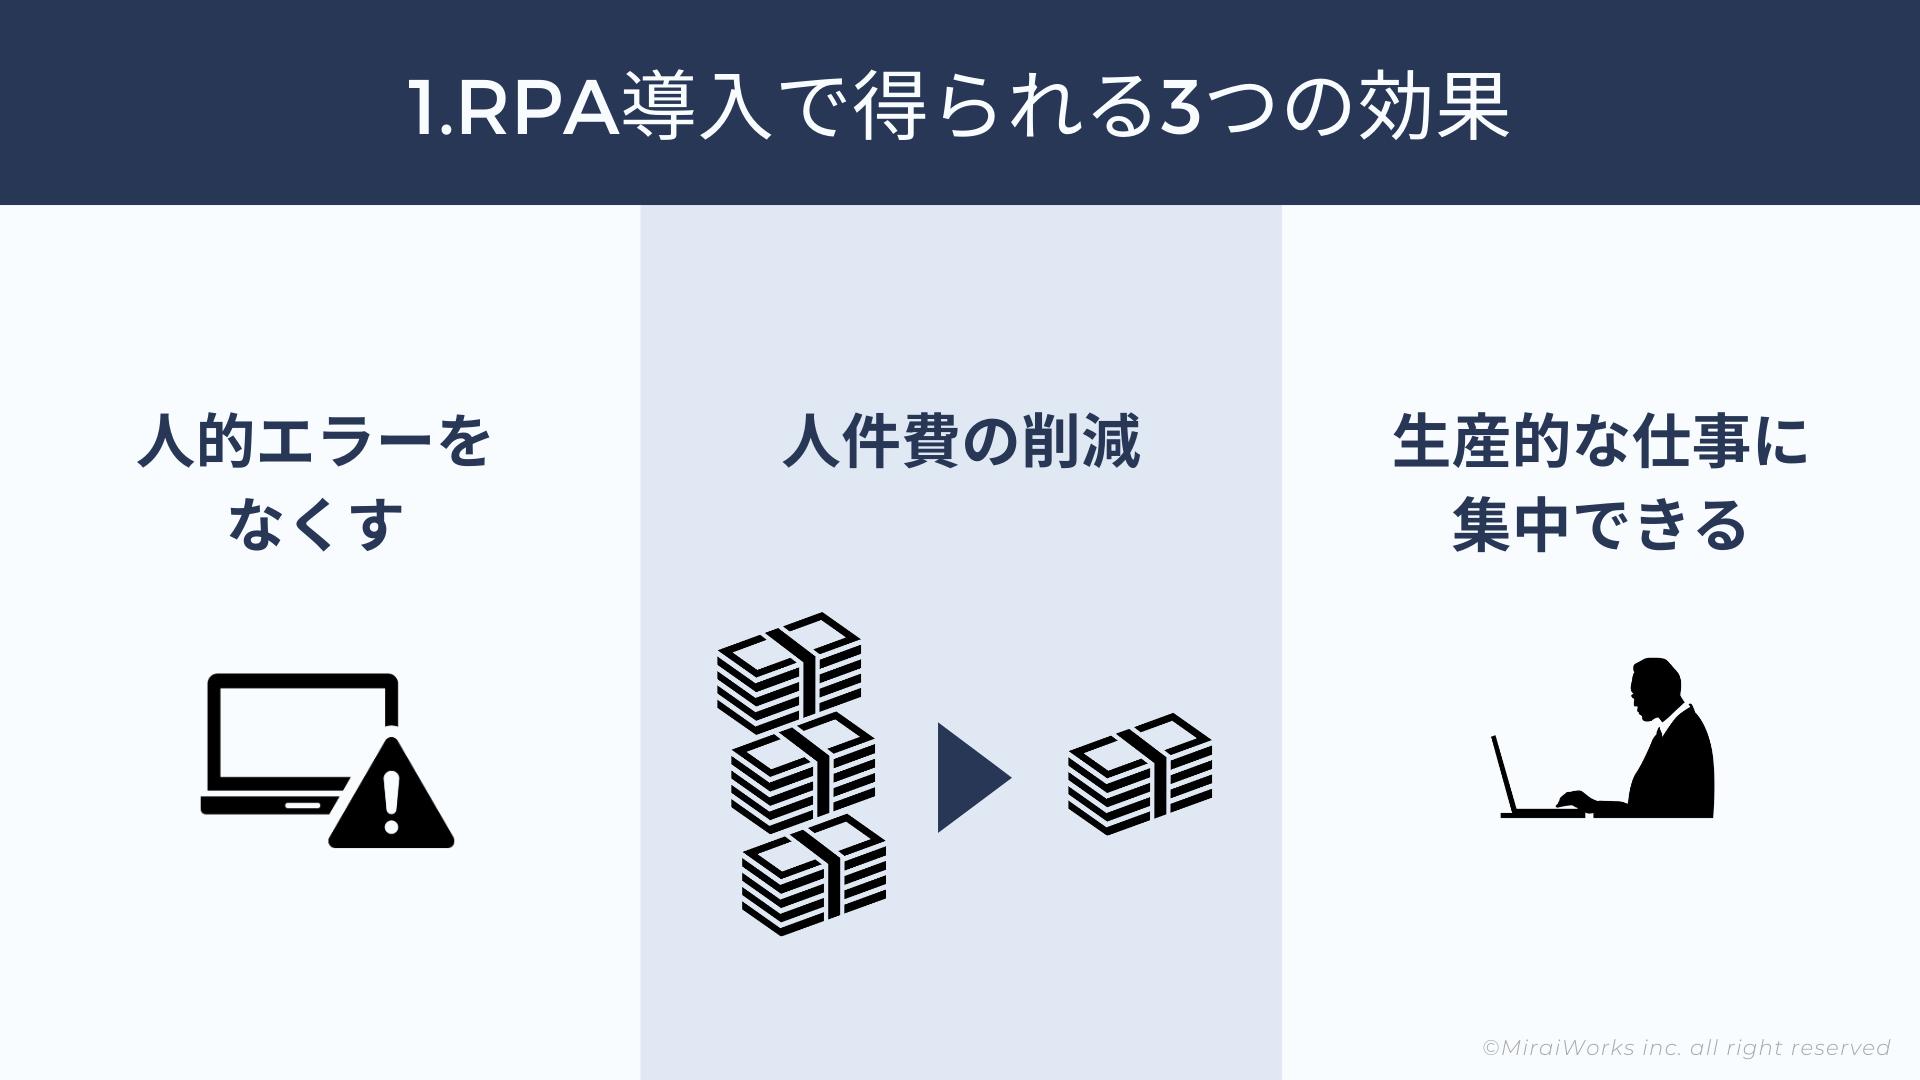 RPA導入_3つの効果_説明png